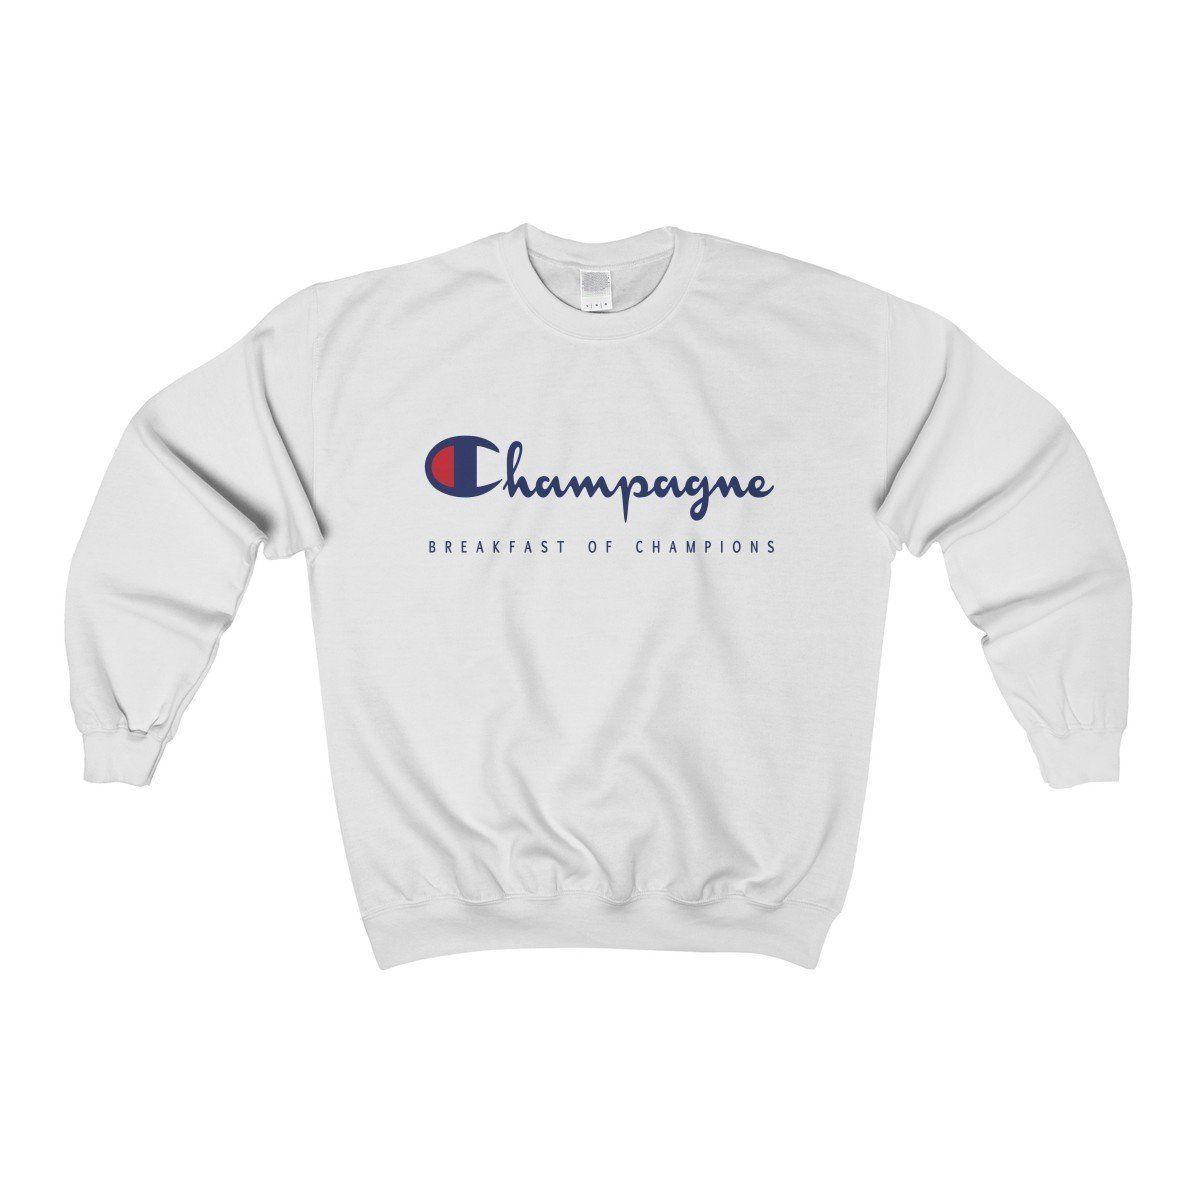 Champagne Sweatshirt Sweatshirts Crew Neck Sweatshirt Feminist Sweatshirt [ 1200 x 1200 Pixel ]